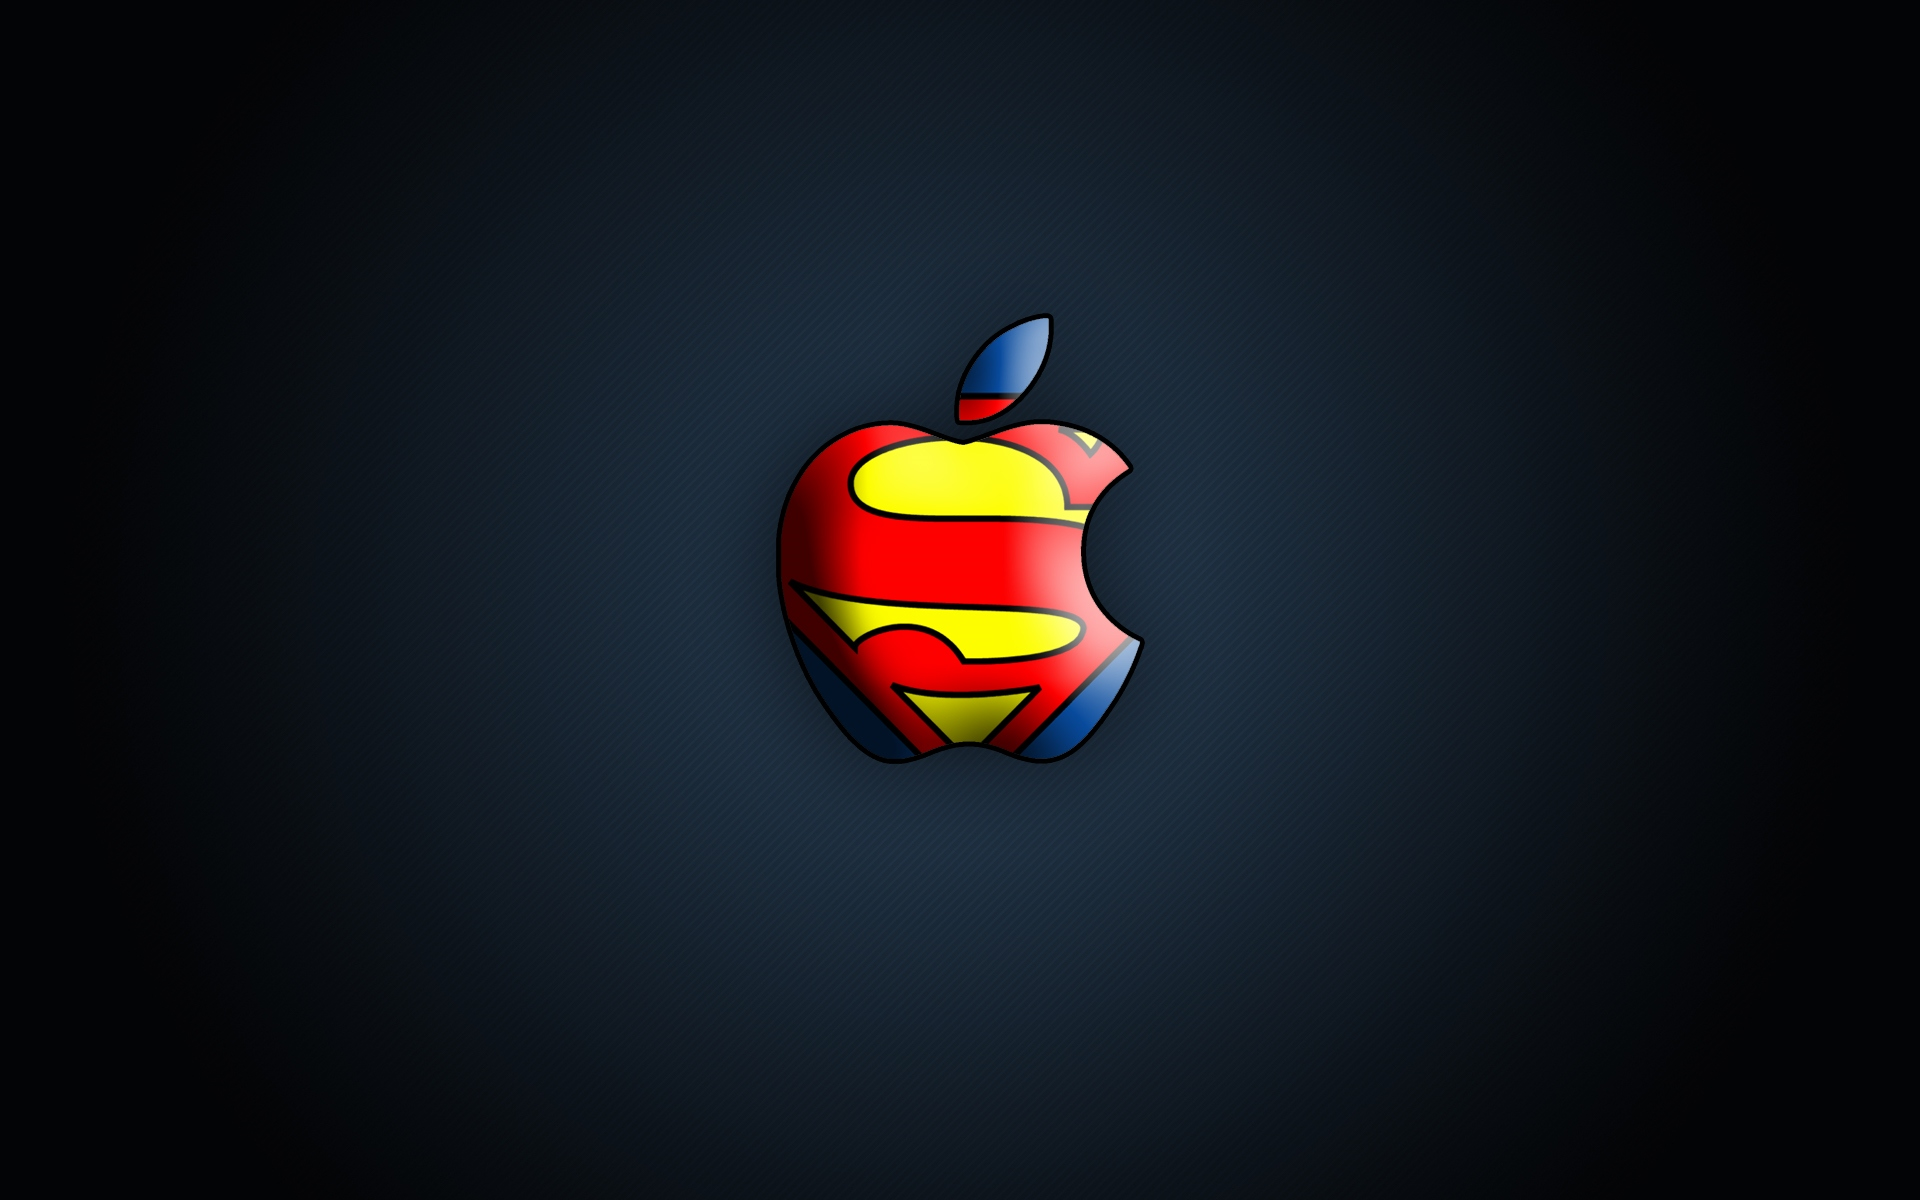 Download Wallpaper Superman 3d Apple Logo Wallpapers Hd A26 Hd Desktop Wallpapers 4k Hd